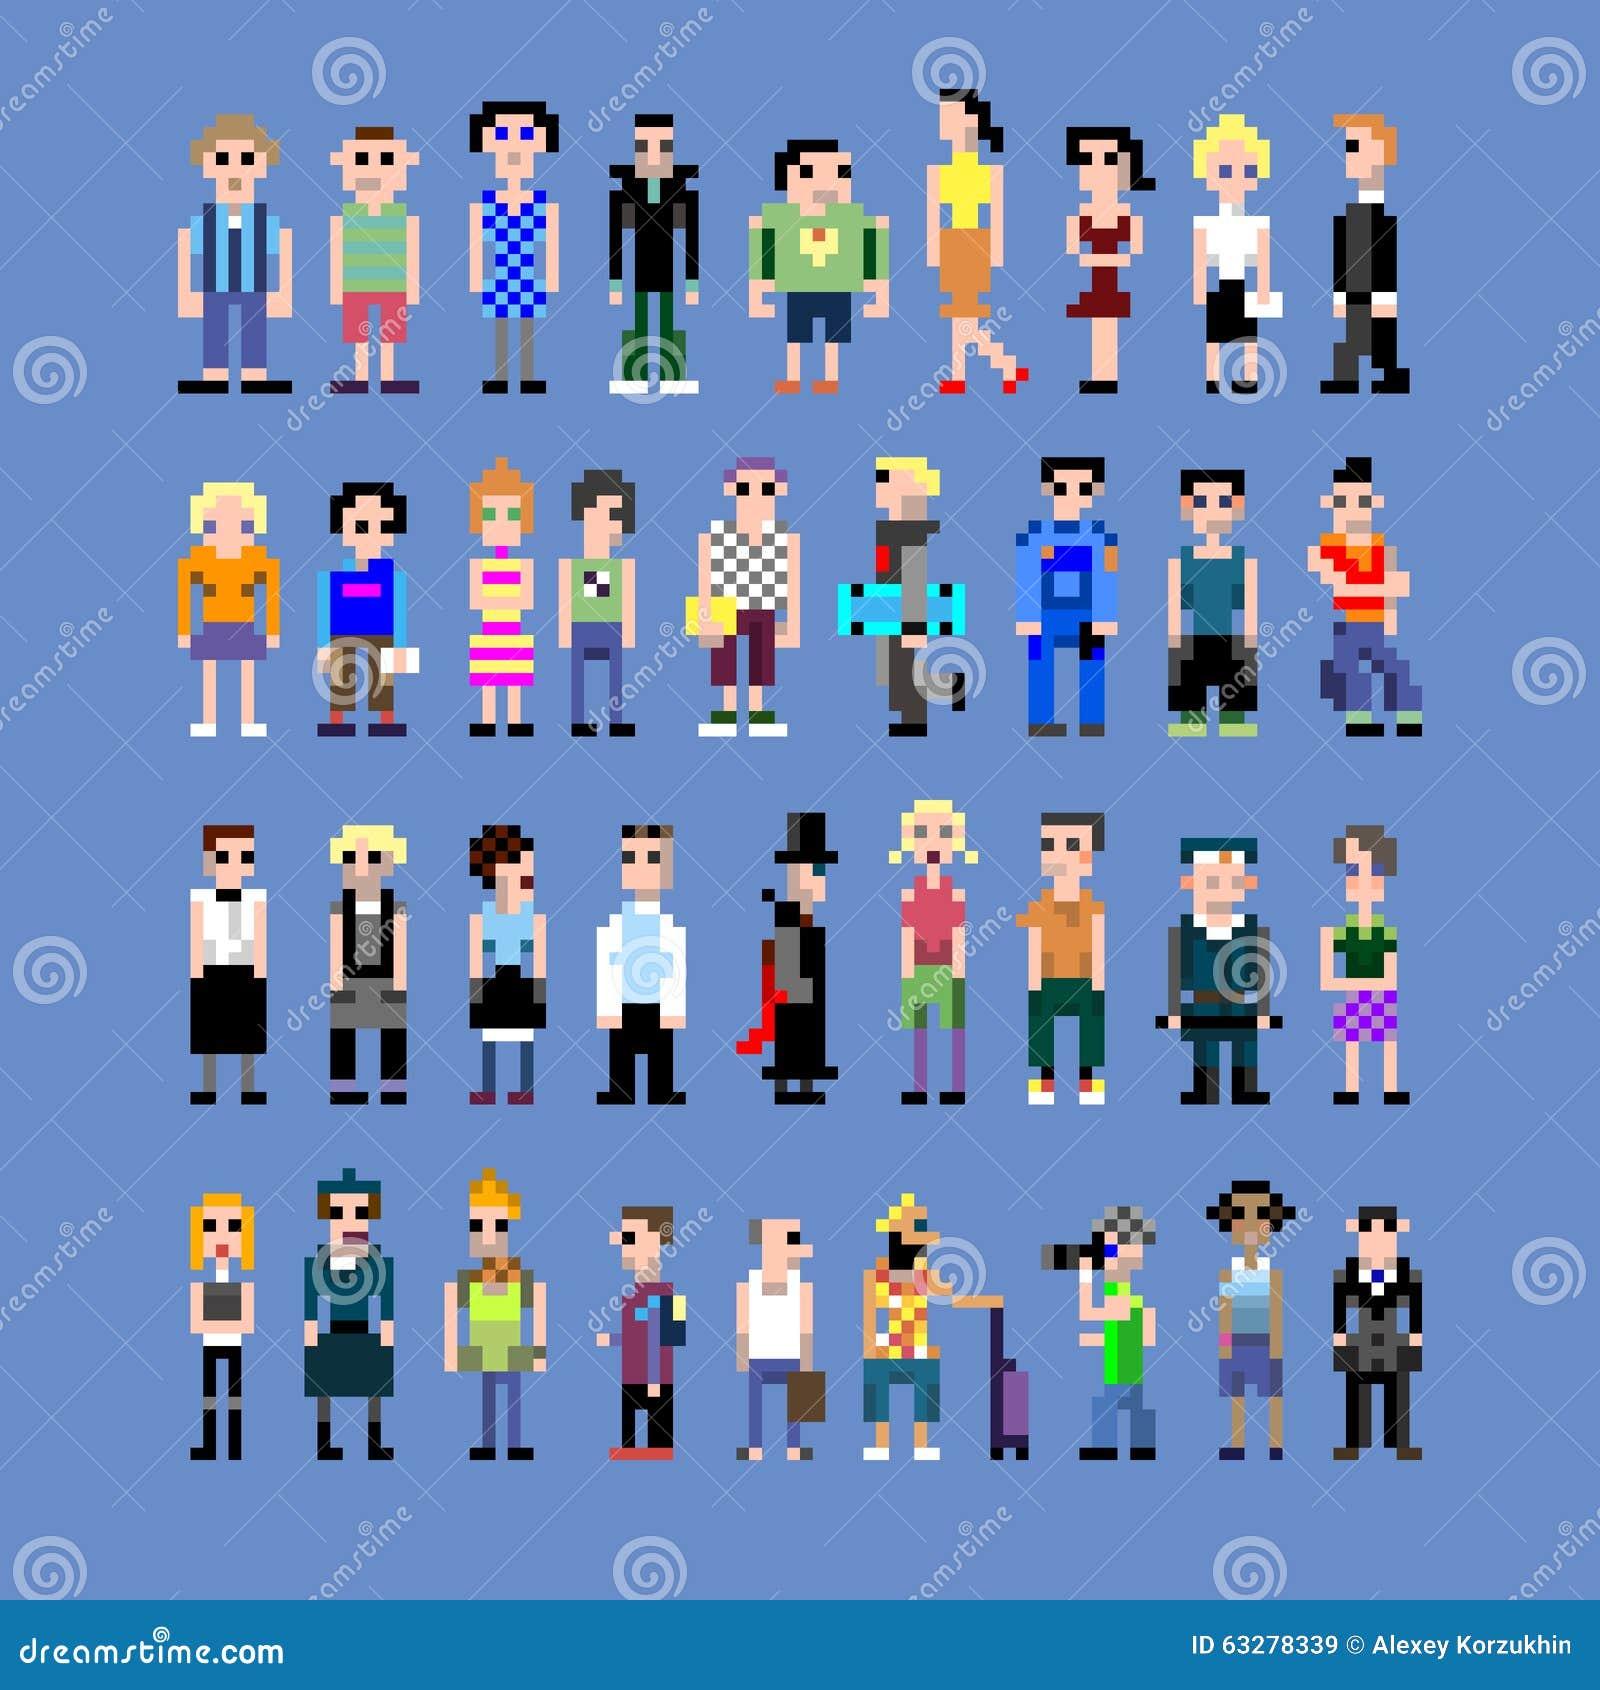 Pixel people stock vector. Illustration of humans, secretary - 63278339